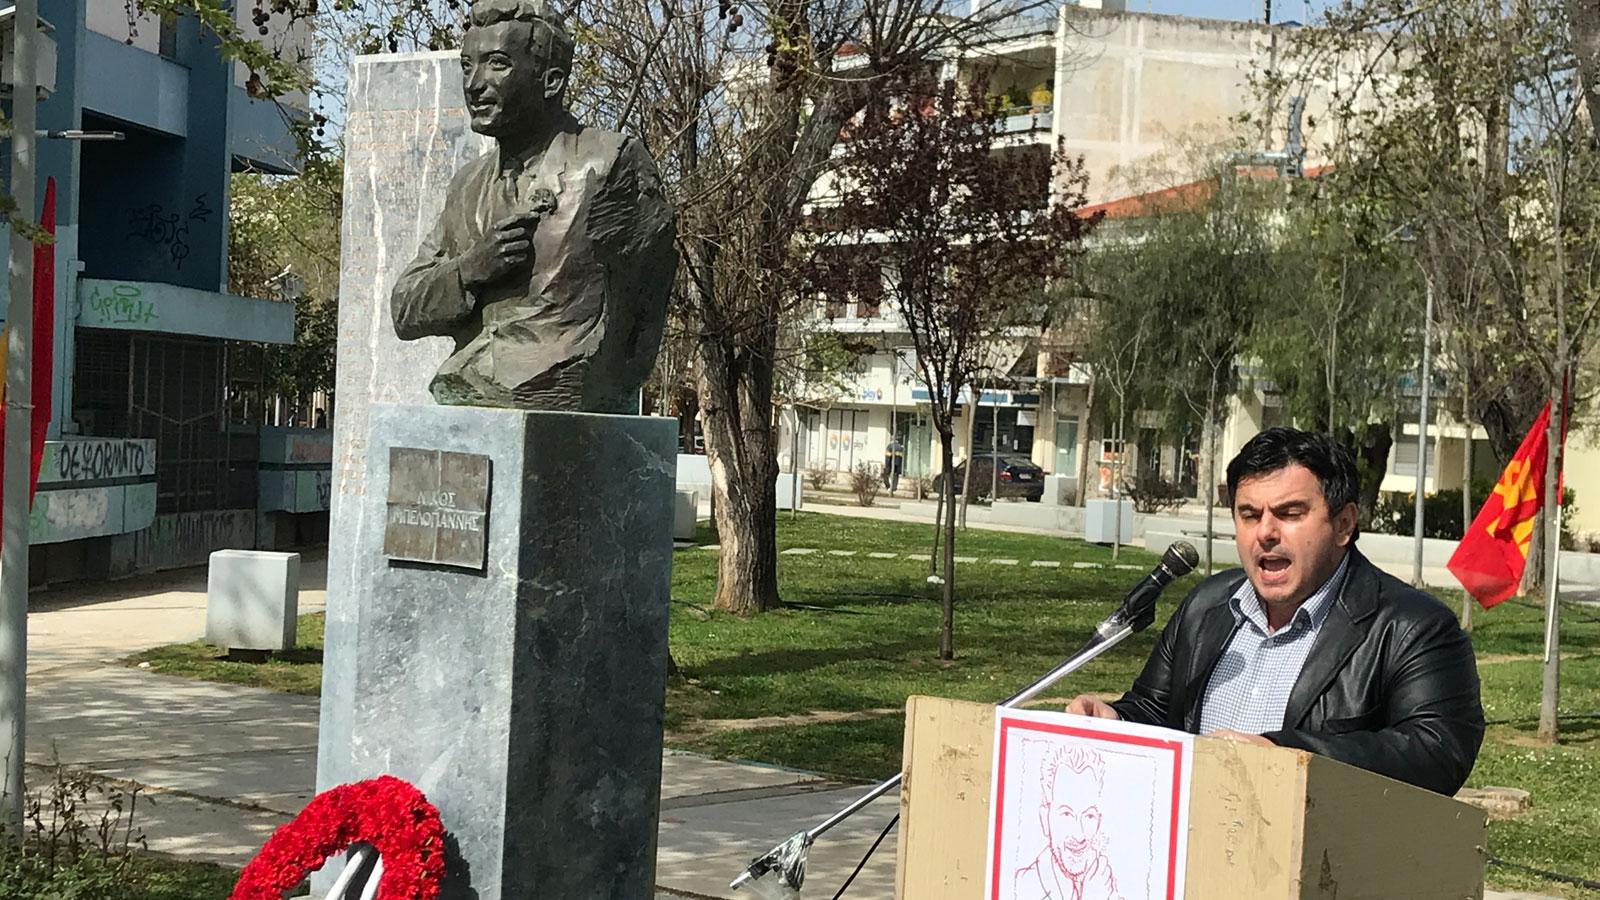 Aμαλιάδα: Εκδήλωση από την Τ.Ε. ΚΚΕ Ηλείας για τα 69 χρόνια από την εκτέλεση του Νίκου Μπελογιάννη (photos)